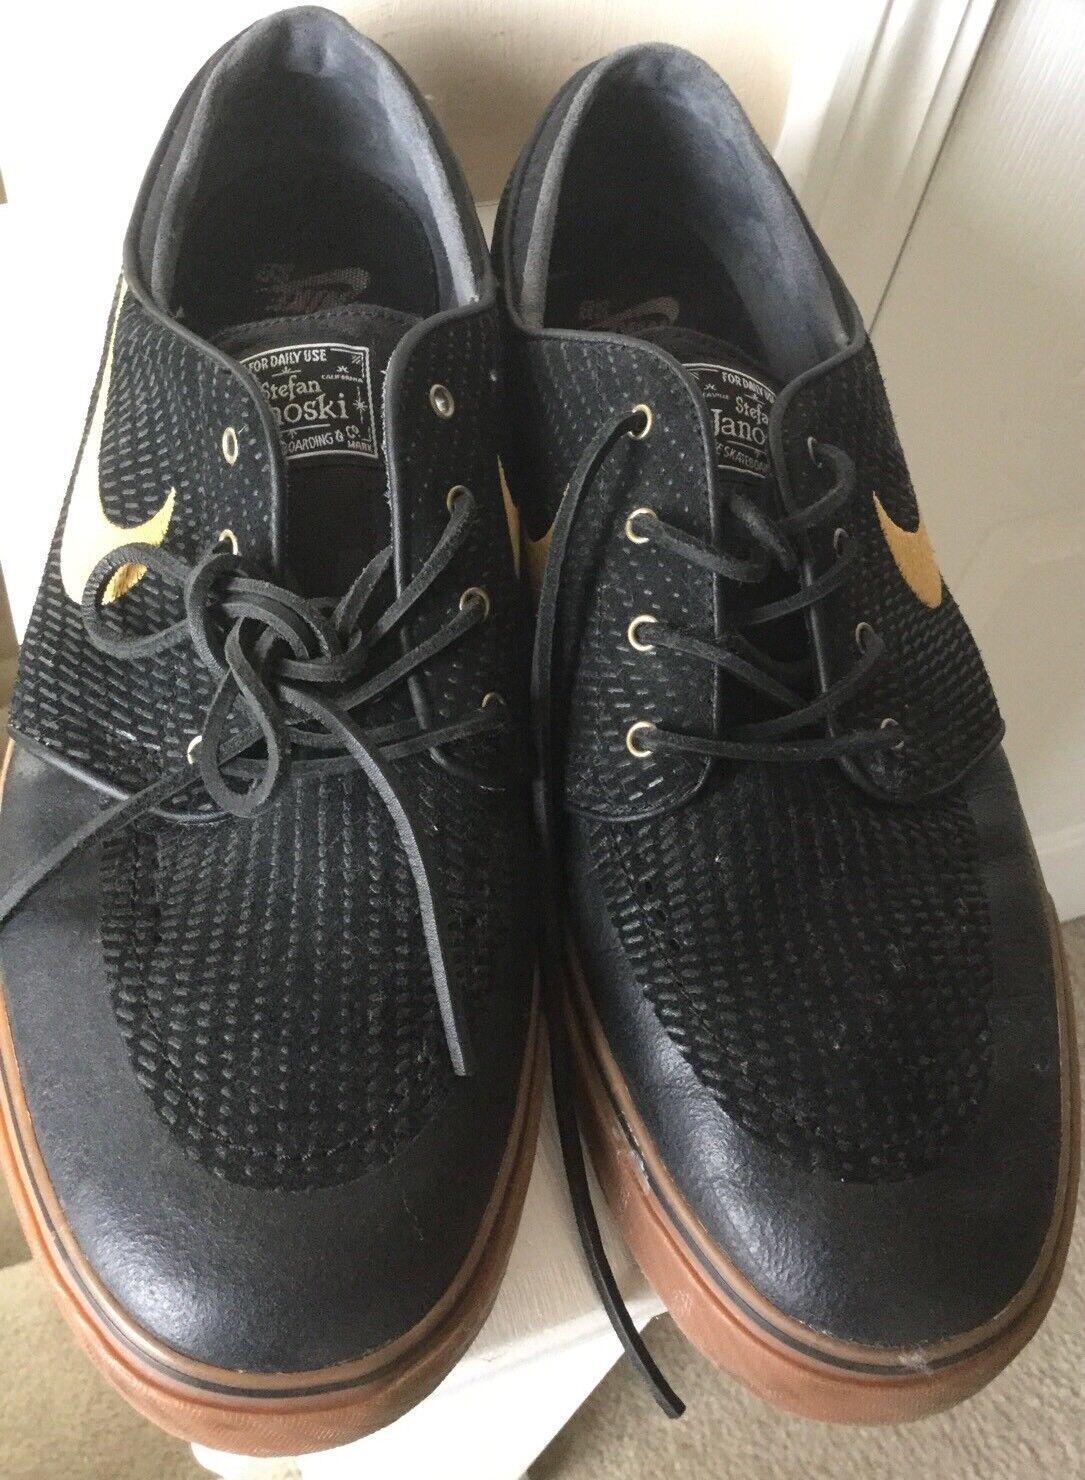 NIKE SB ZOOM STEFAN JANOSKI PR SE BLACK GOLD LIGHT BROWN 631298 020 - SIZE 12 Wild casual shoes